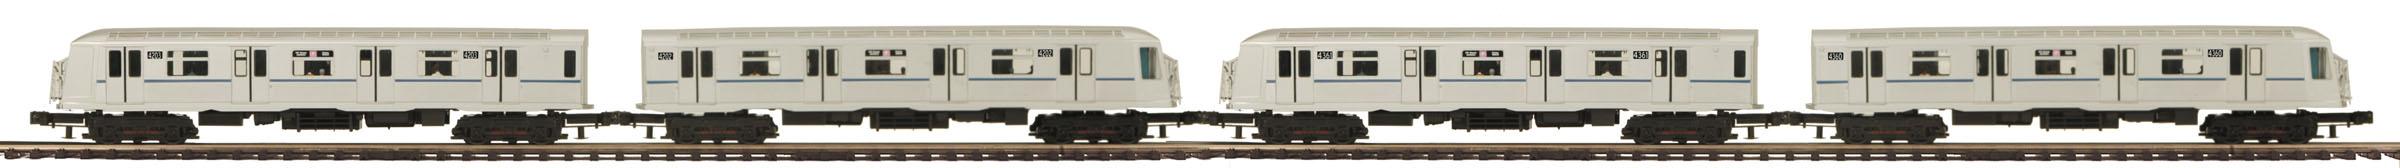 20 2717 1 mth electric trains. Black Bedroom Furniture Sets. Home Design Ideas